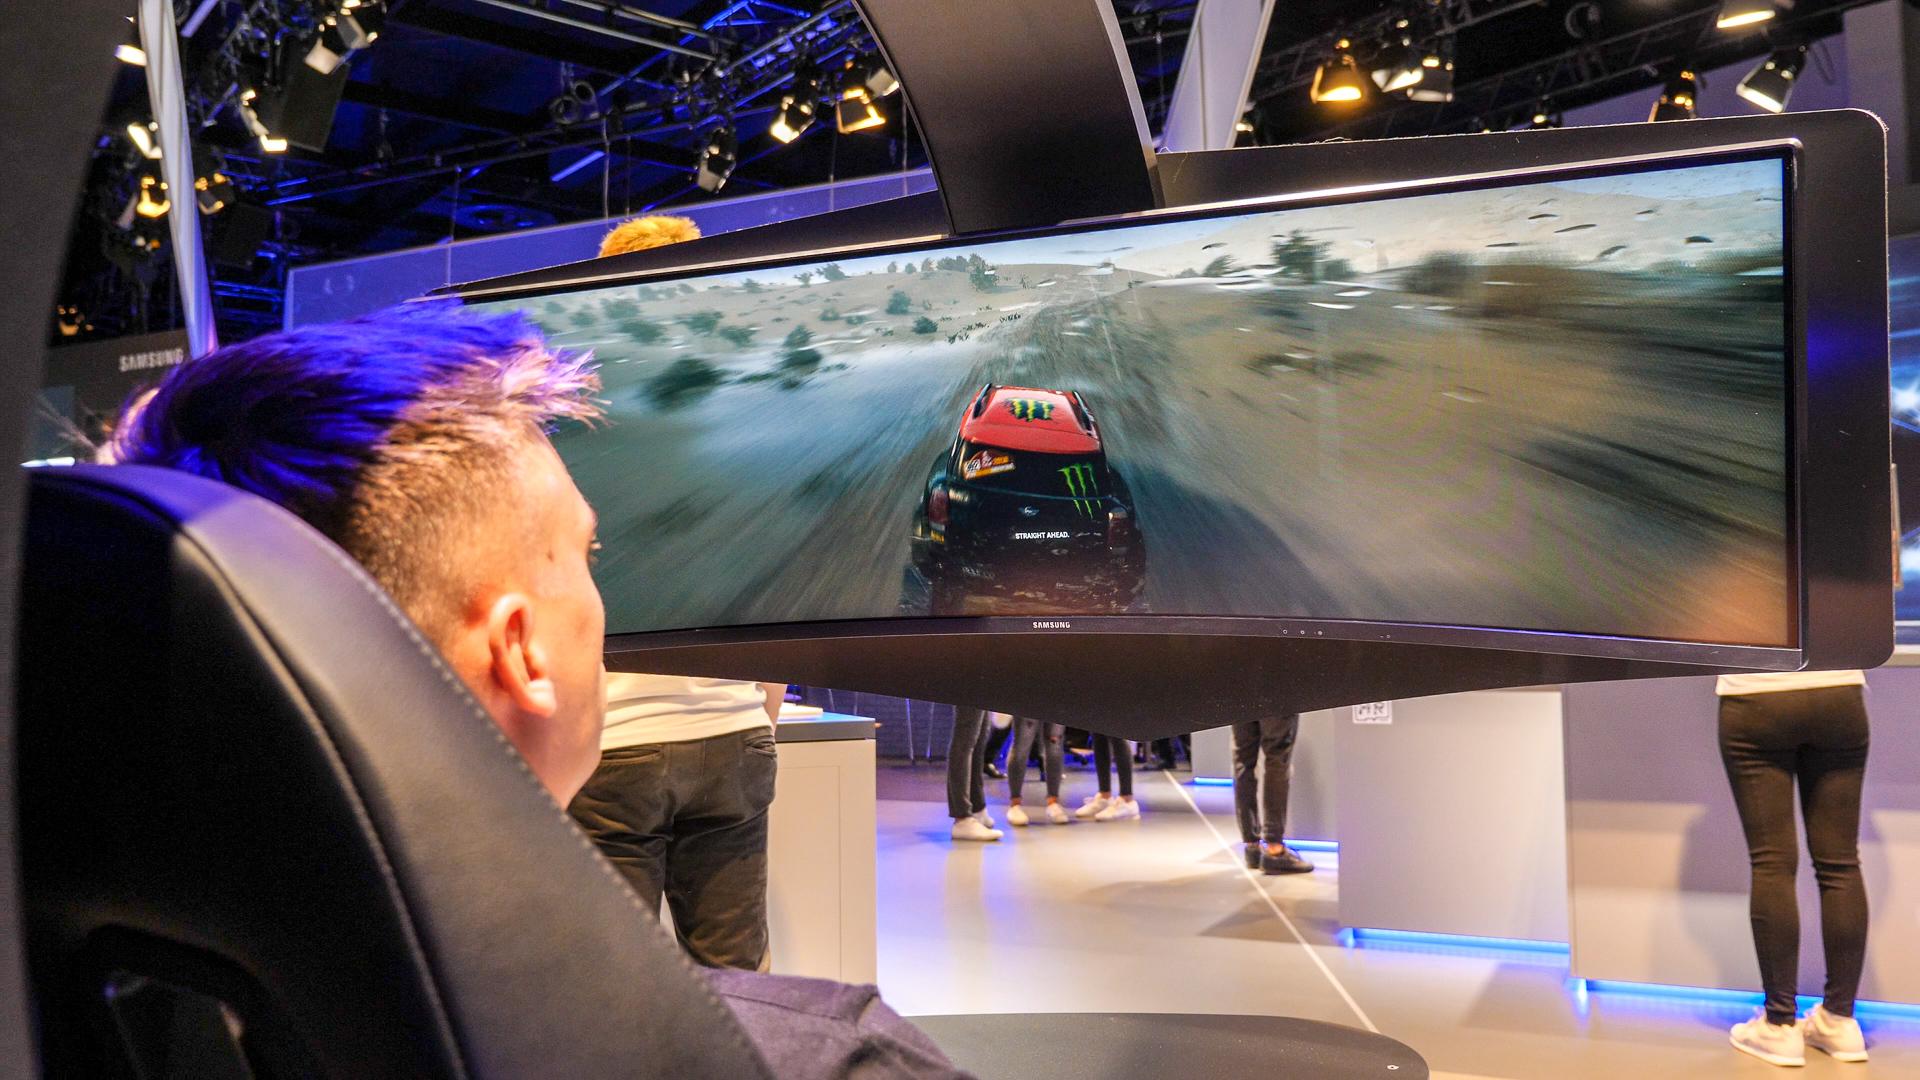 Samsung's EPIC Gaming Monitors @ Gamescom 2018! | The Tech Chap